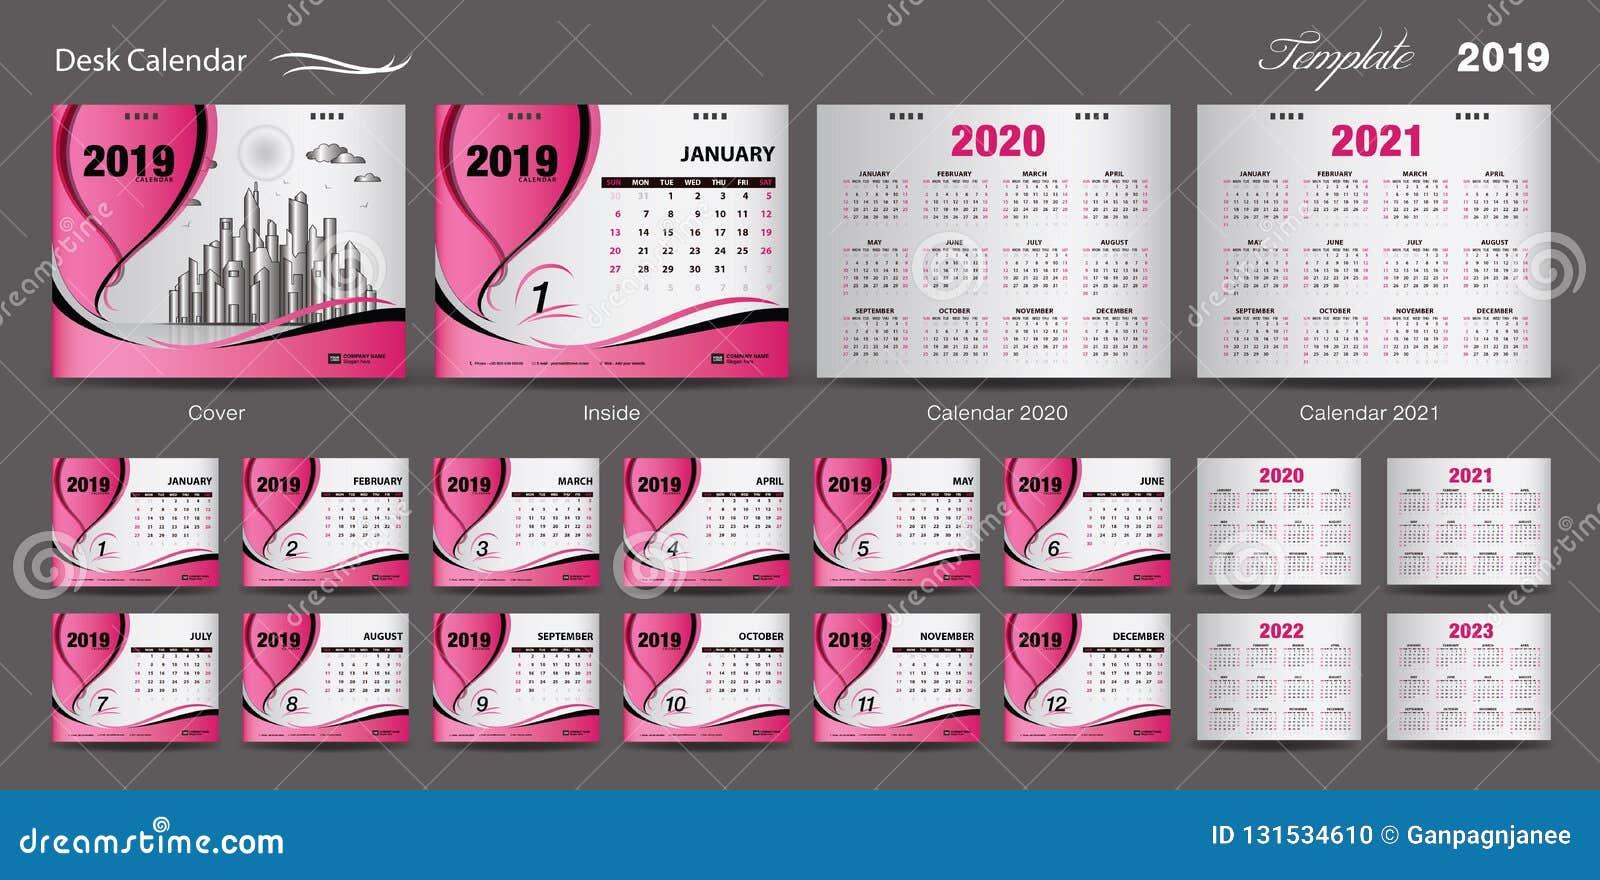 Set Desk Calendar 2019 Template Design Vector, Calendar 2020, 2021